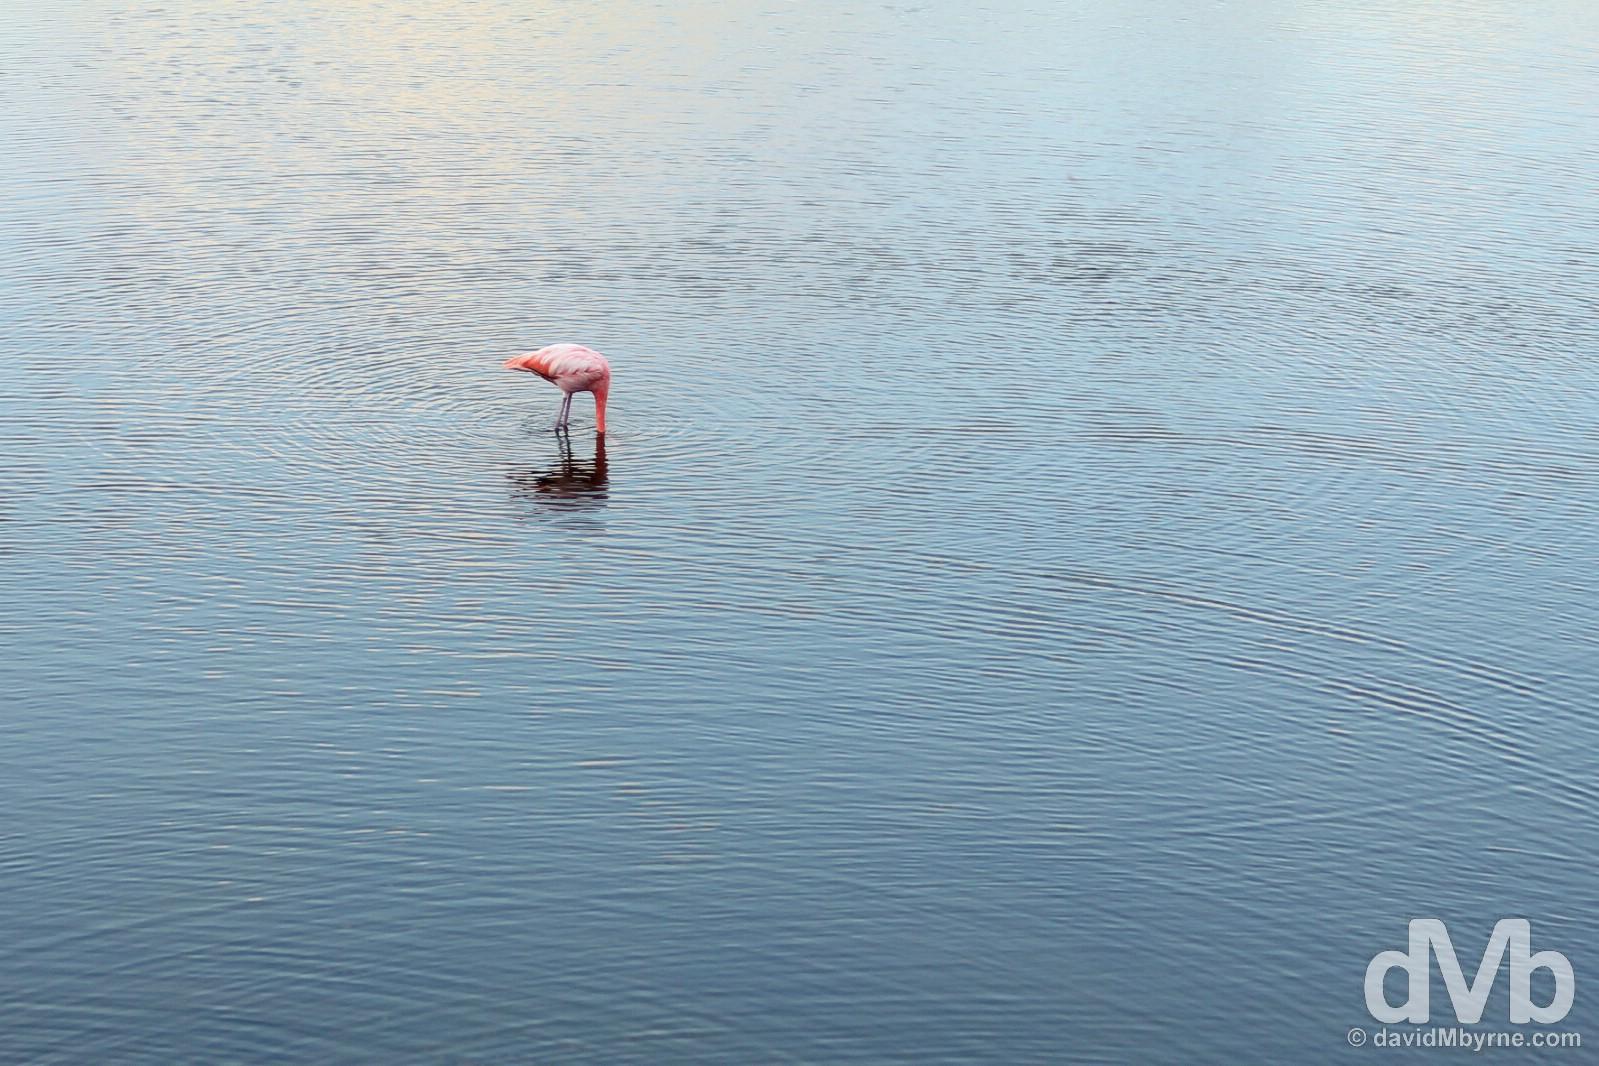 A Flamingo in a pond on Isla Isabela, Galapagos, Ecuador. July 19, 2015.